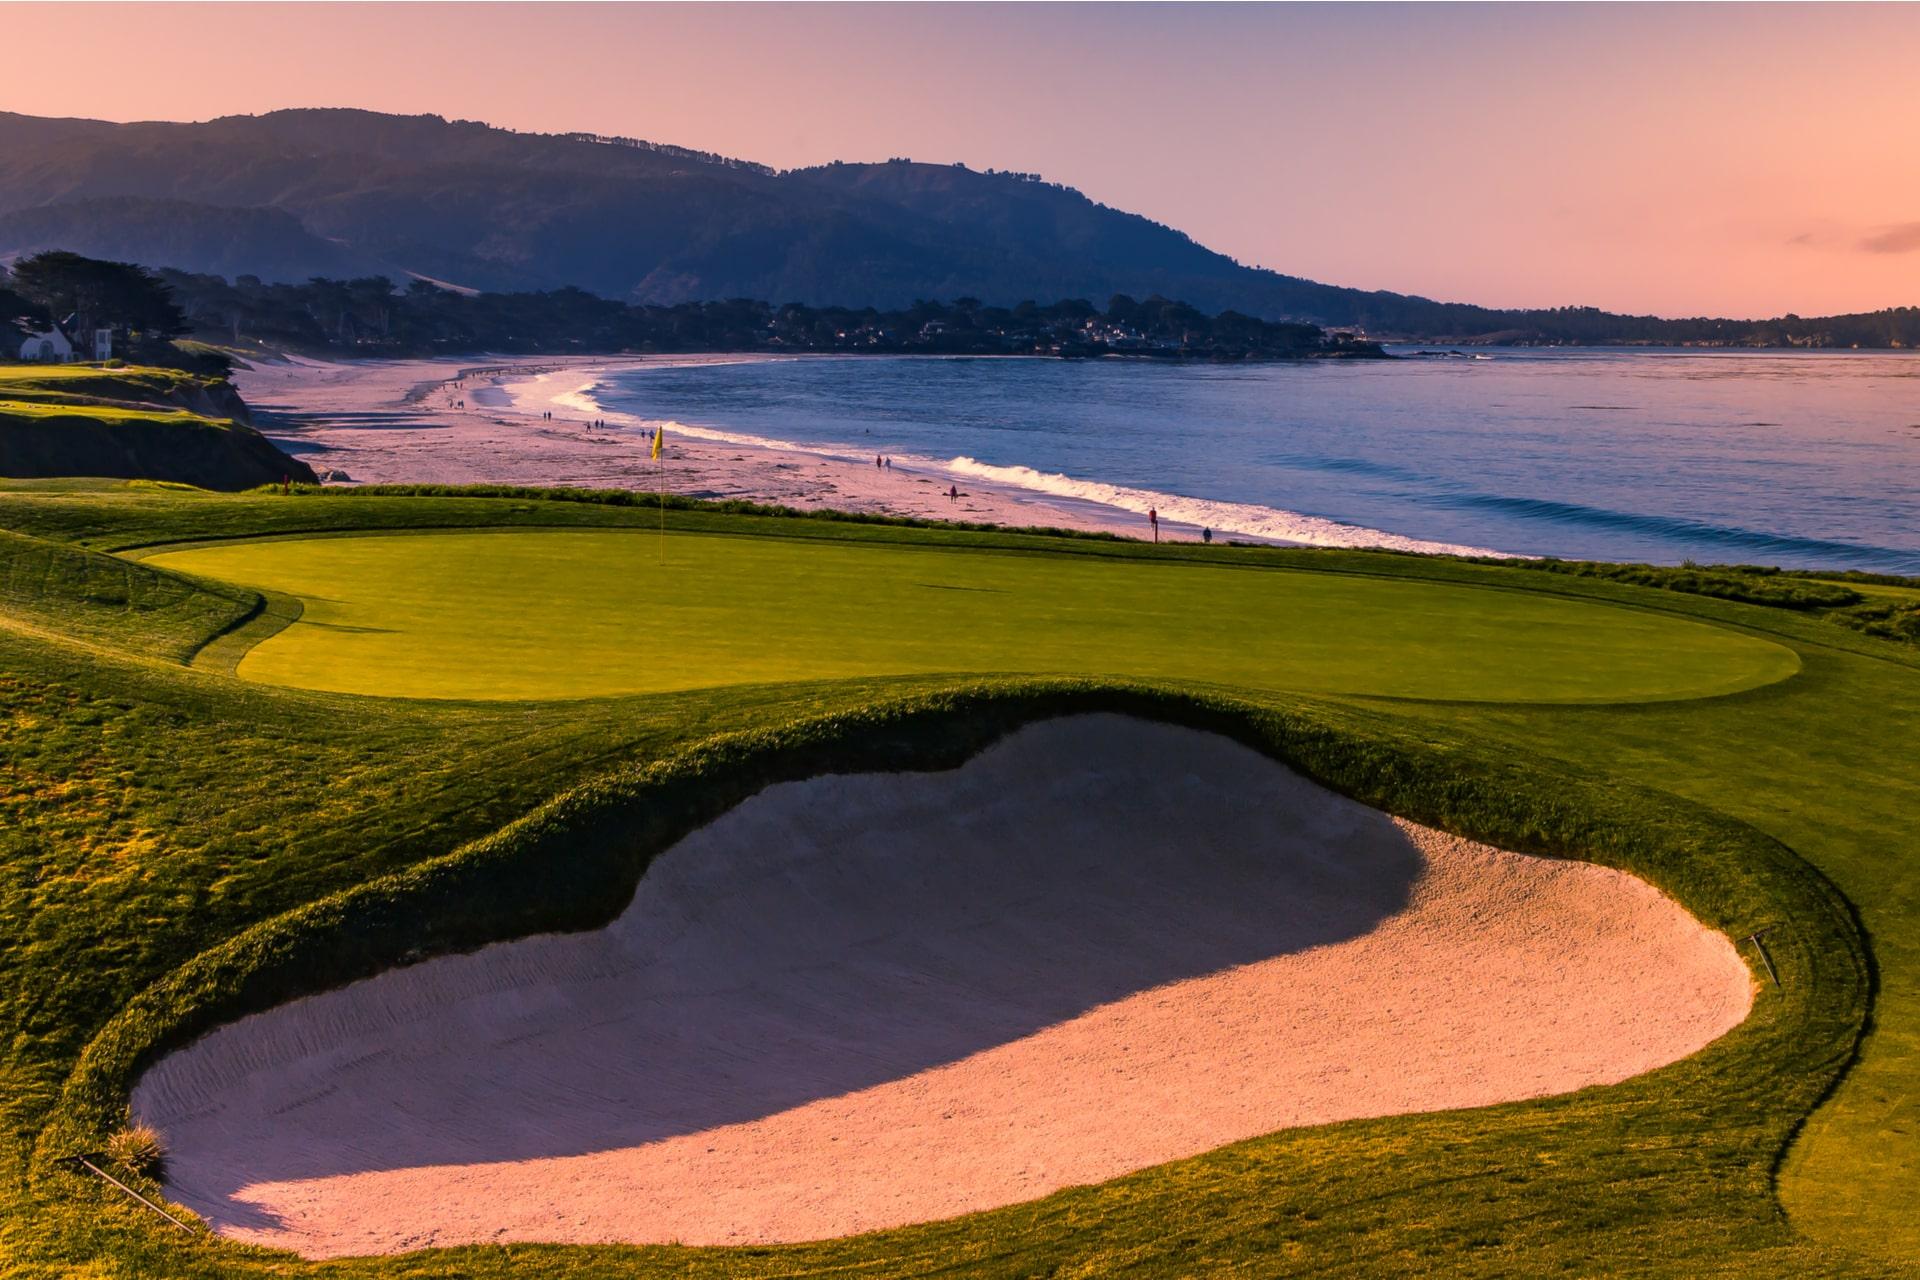 Pebble Beach, California, USA